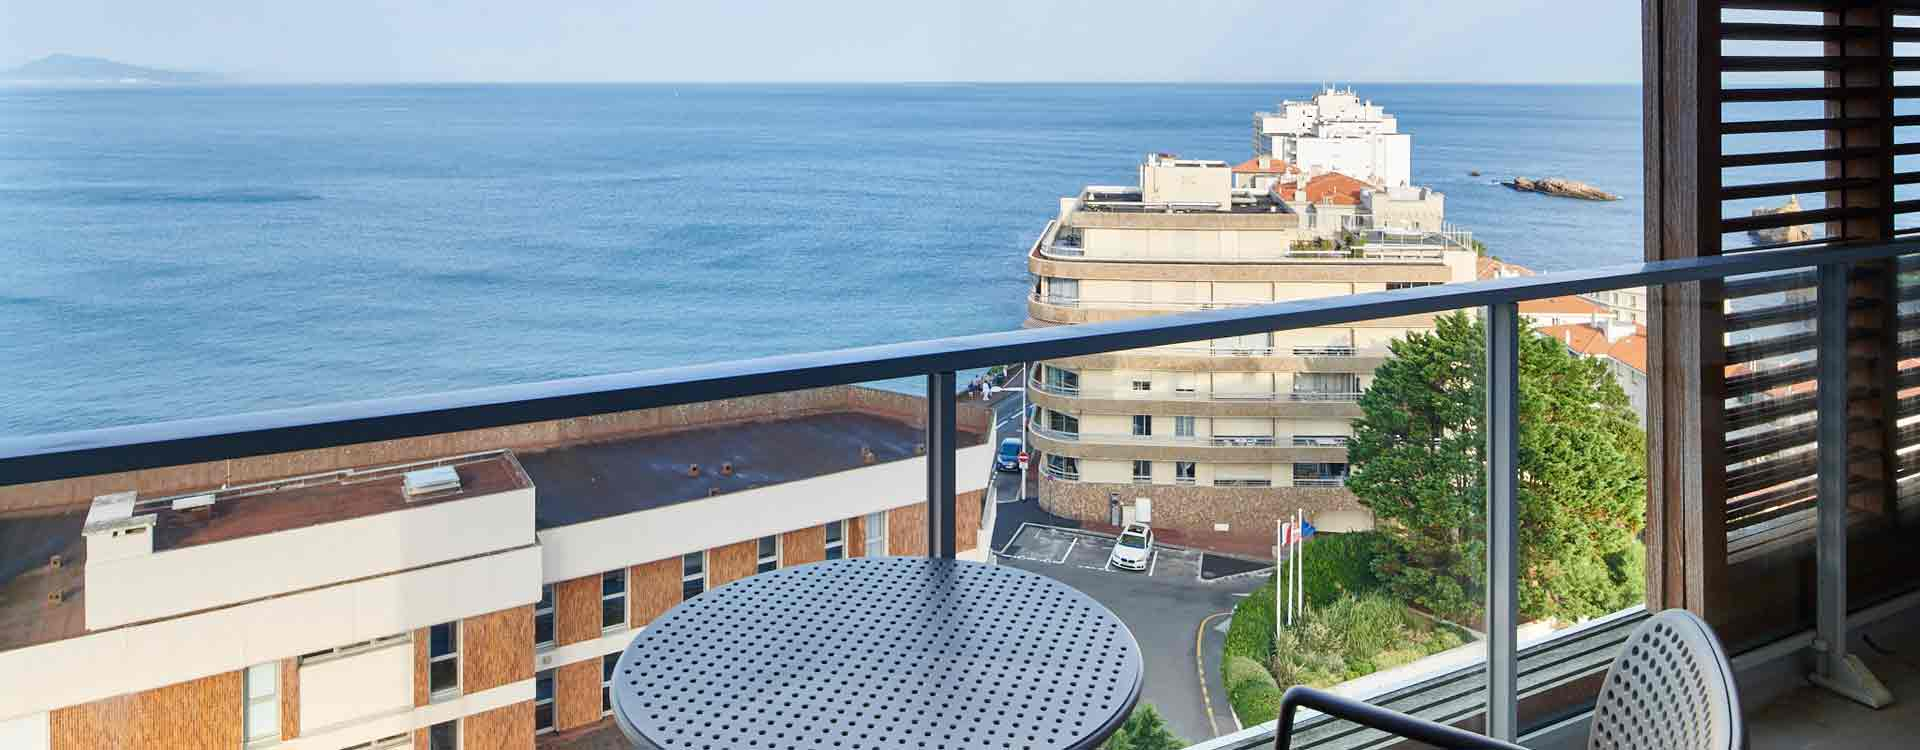 appart hotel biarritz vue mer